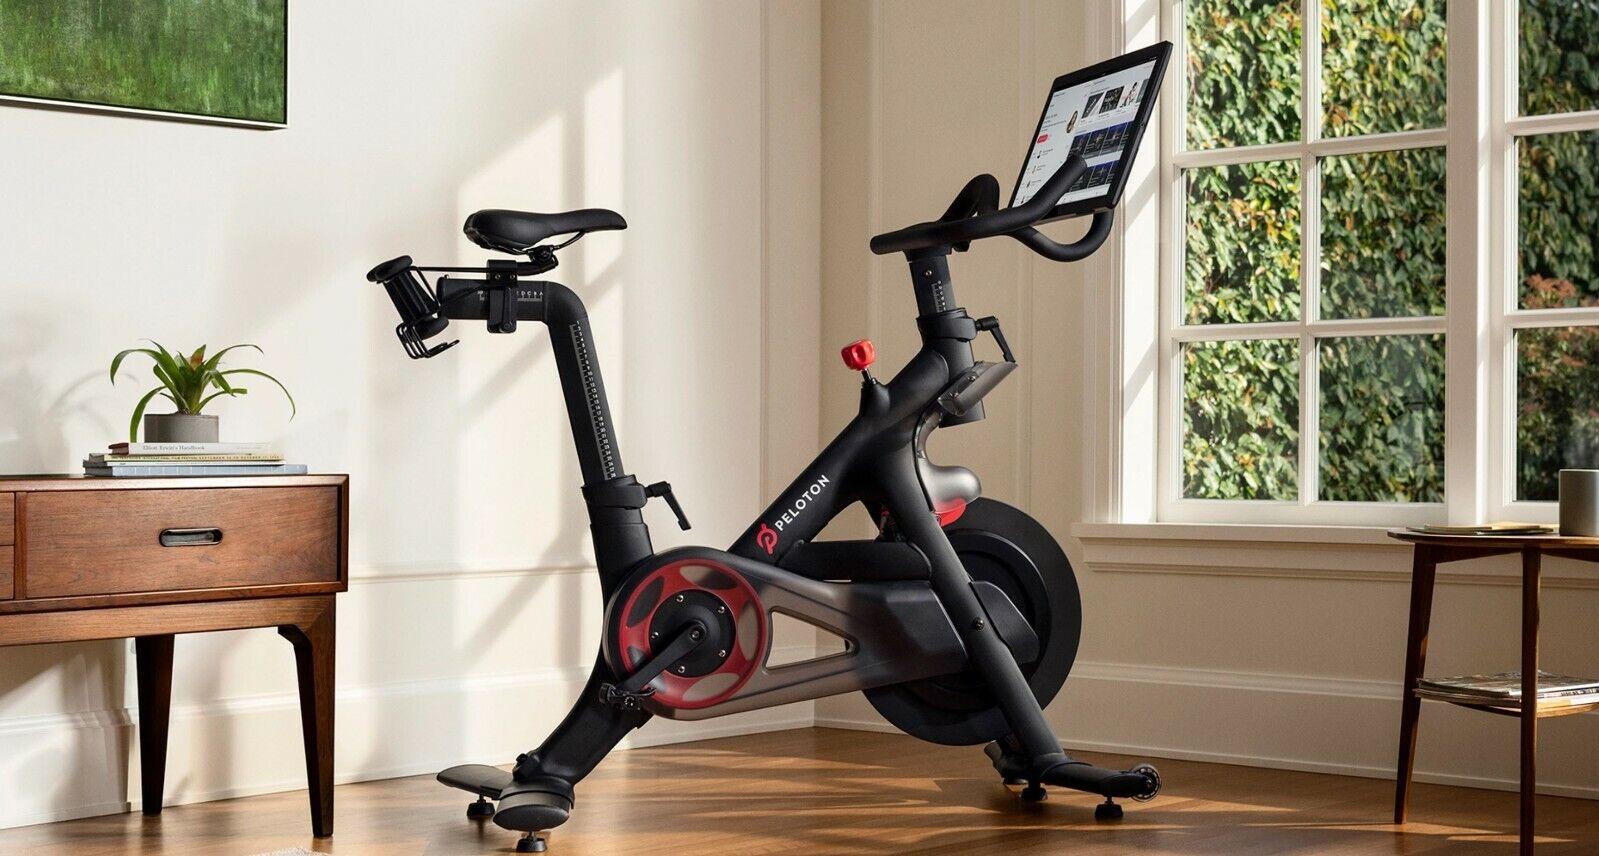 Peloton Bike Or Tread Coupon 100 Code 47V43X - $0.99